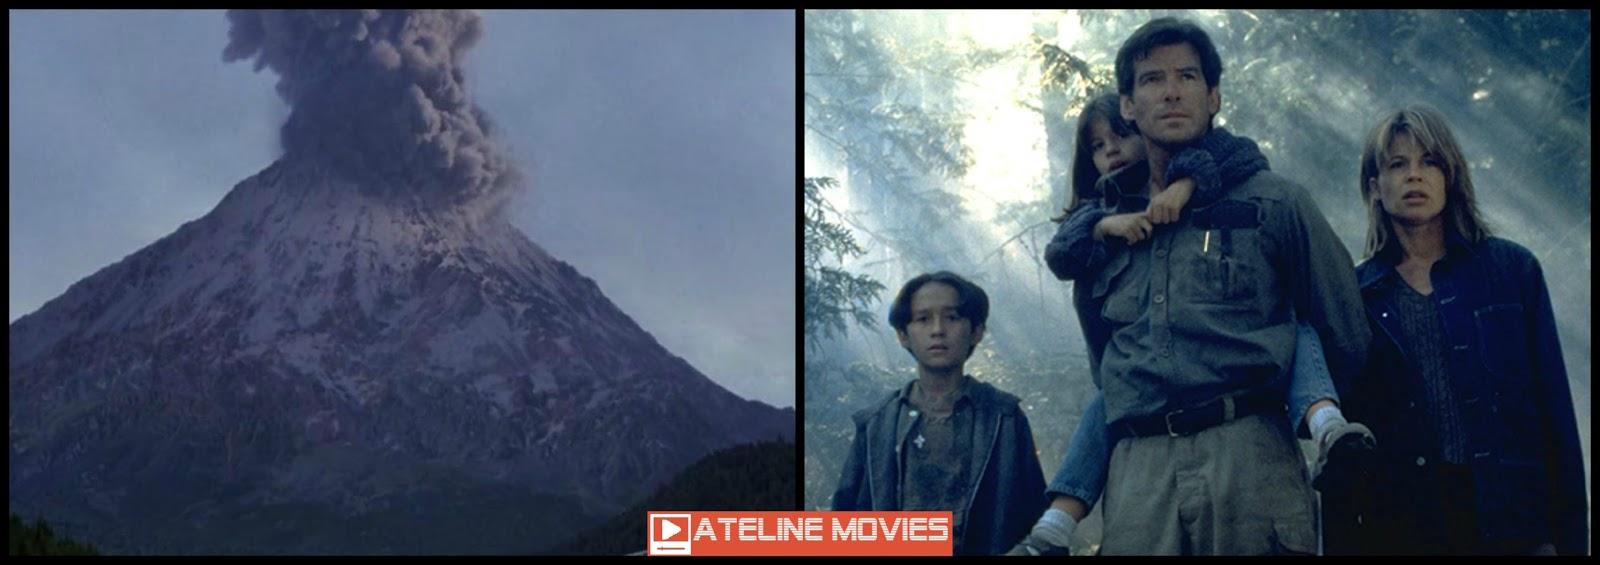 Movie Review Dante S Peak Dateline Movies